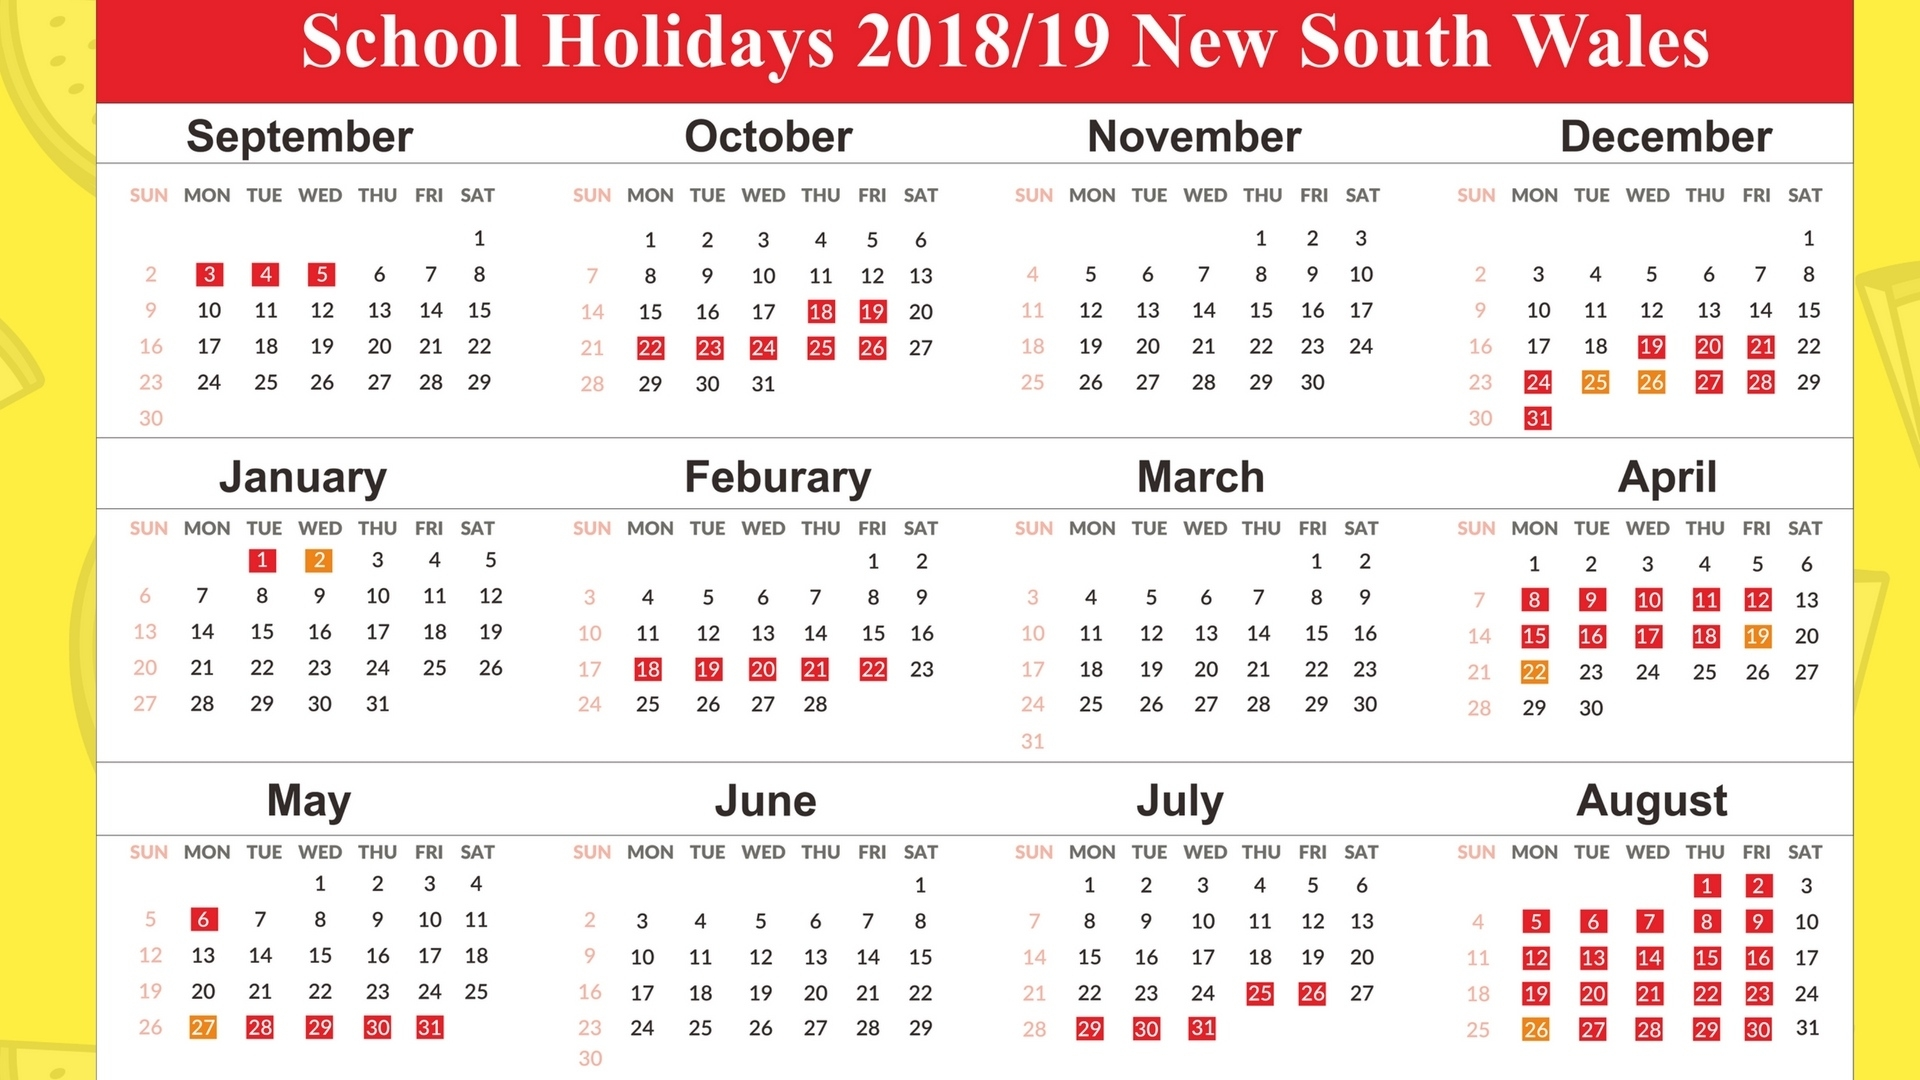 Free Printable School Holidays Calendar 2019 Nsw November 2018 Exceptional School Calendar Nsw 2019